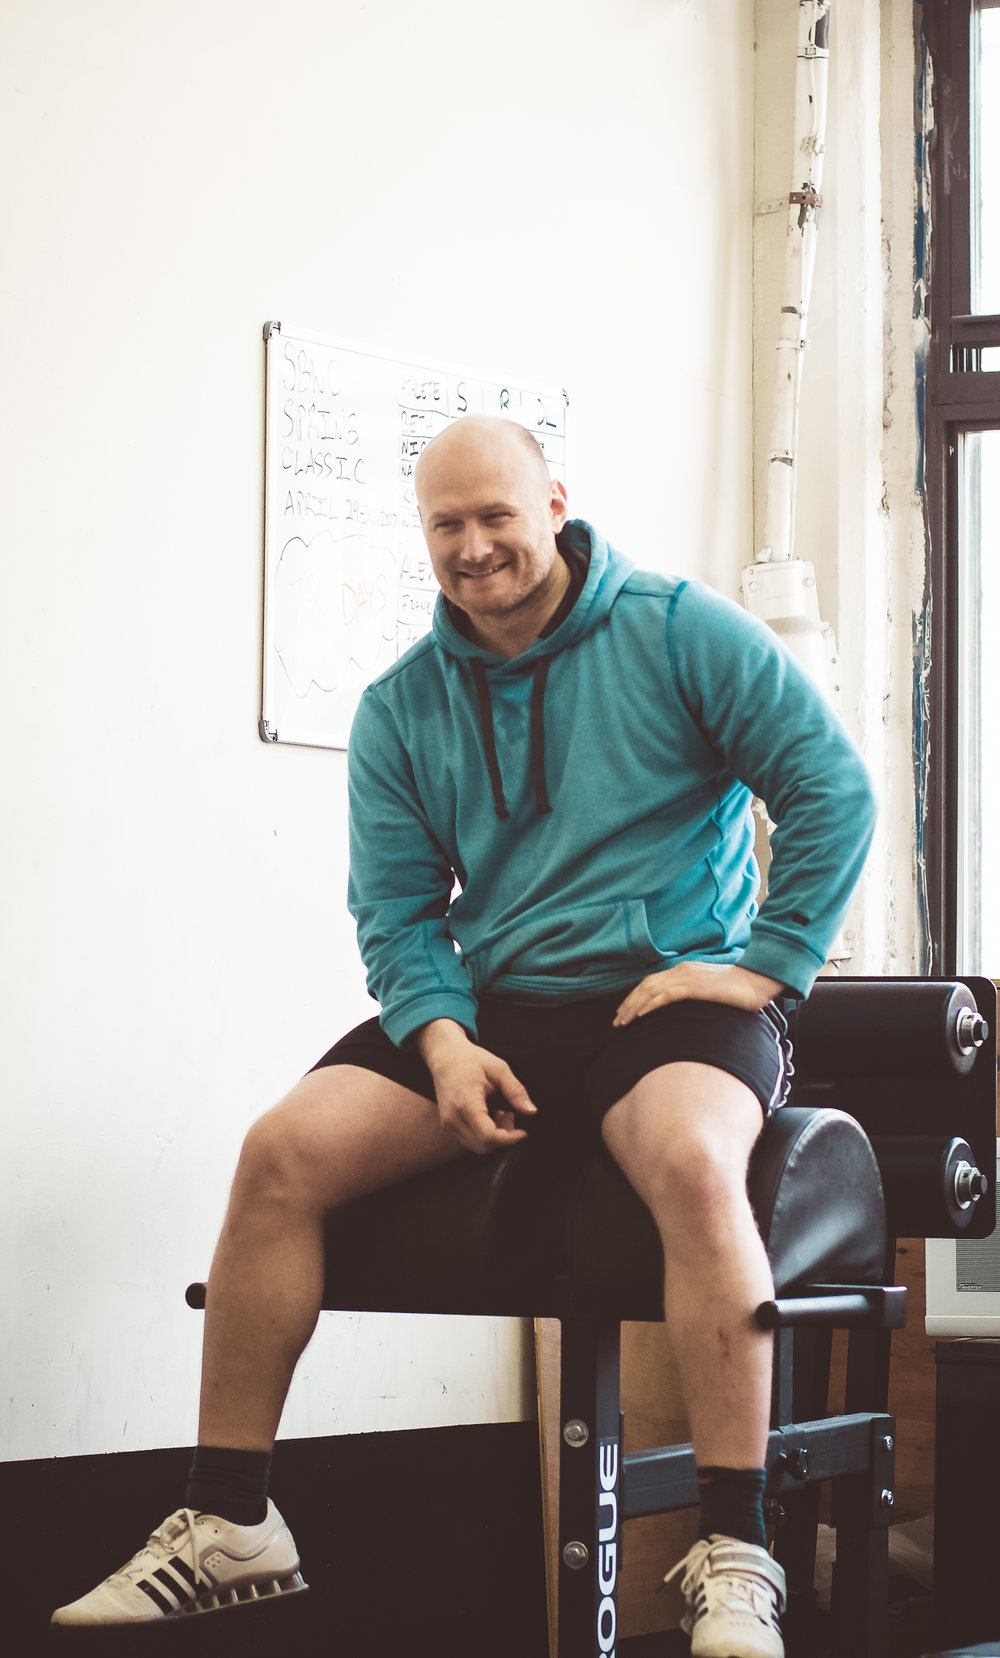 yasha-kahn-weightlifting-coach-2.jpg